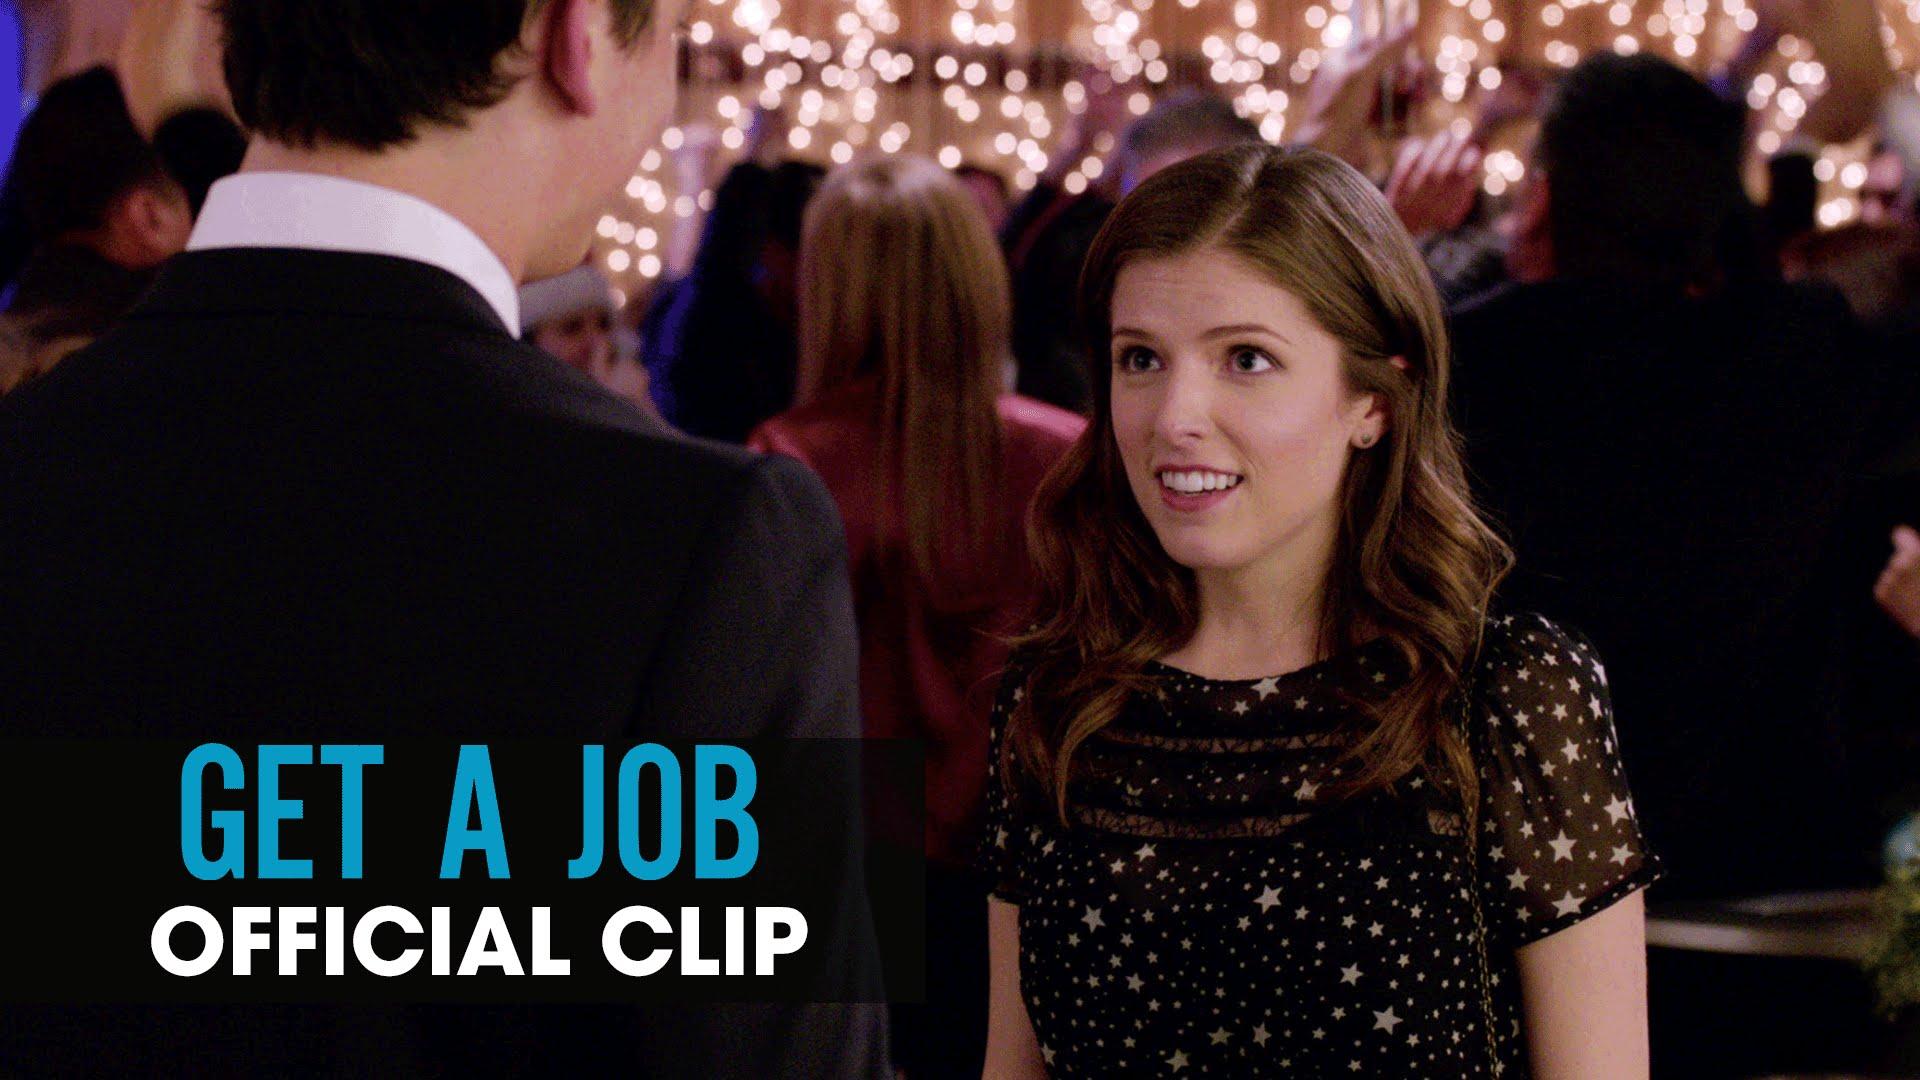 Get A Job  (2016 Movie – Miles Teller, Anna Kendrick, Bryan Cranston) – Official Clip